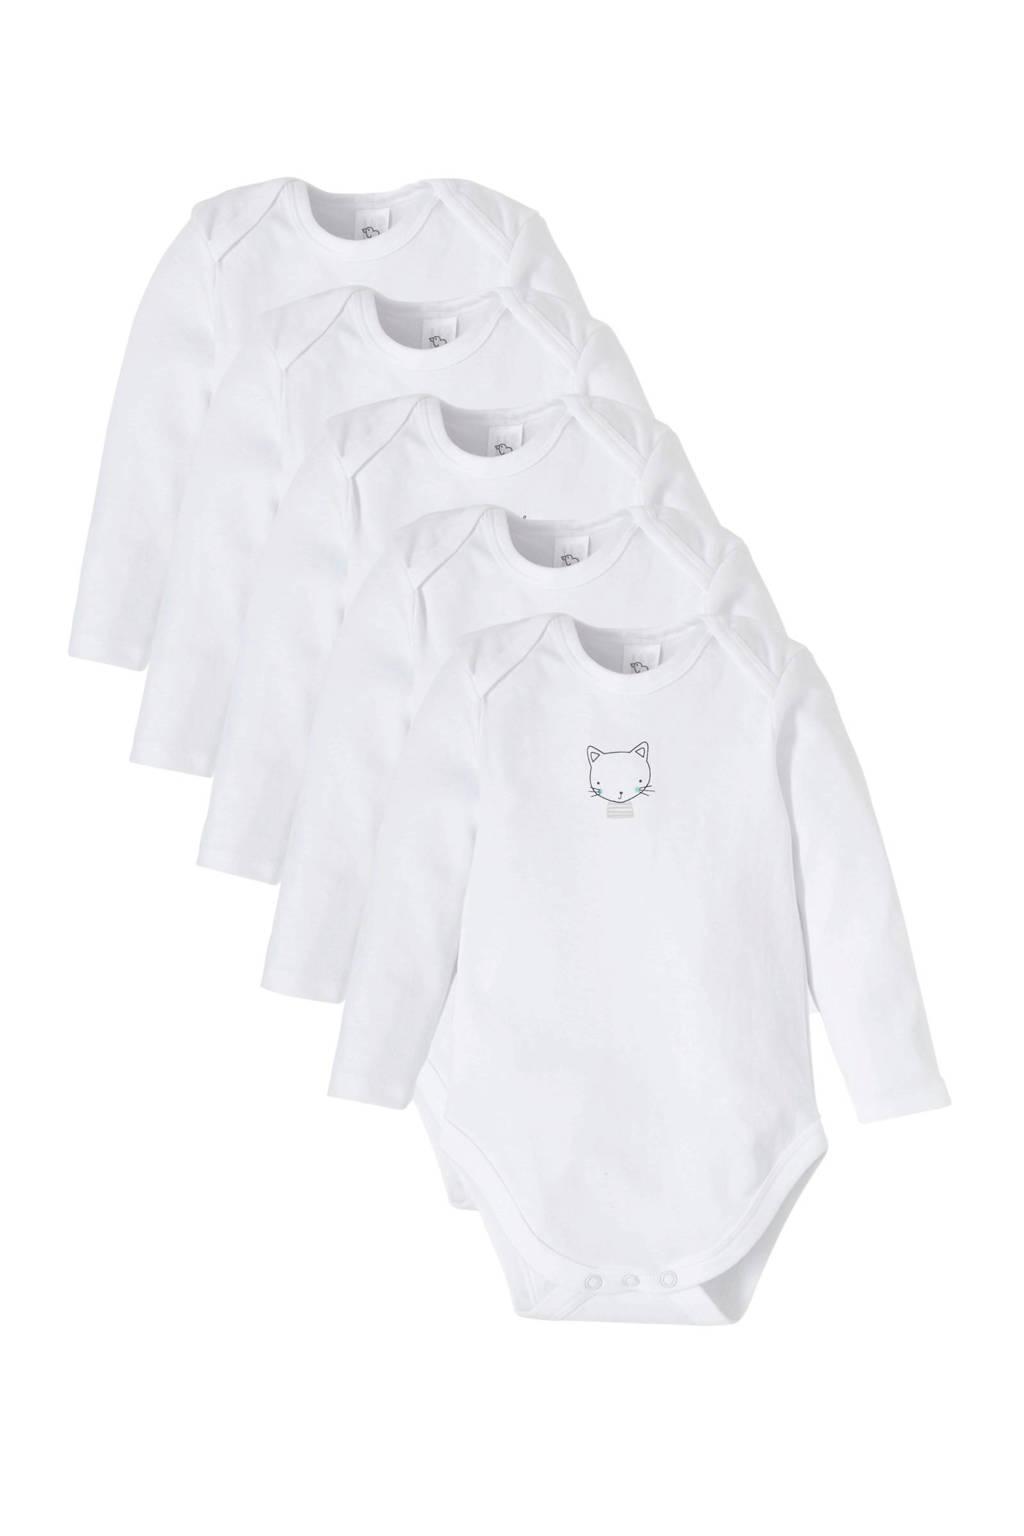 C&A Baby Club romper - set van 5 wit, Wit